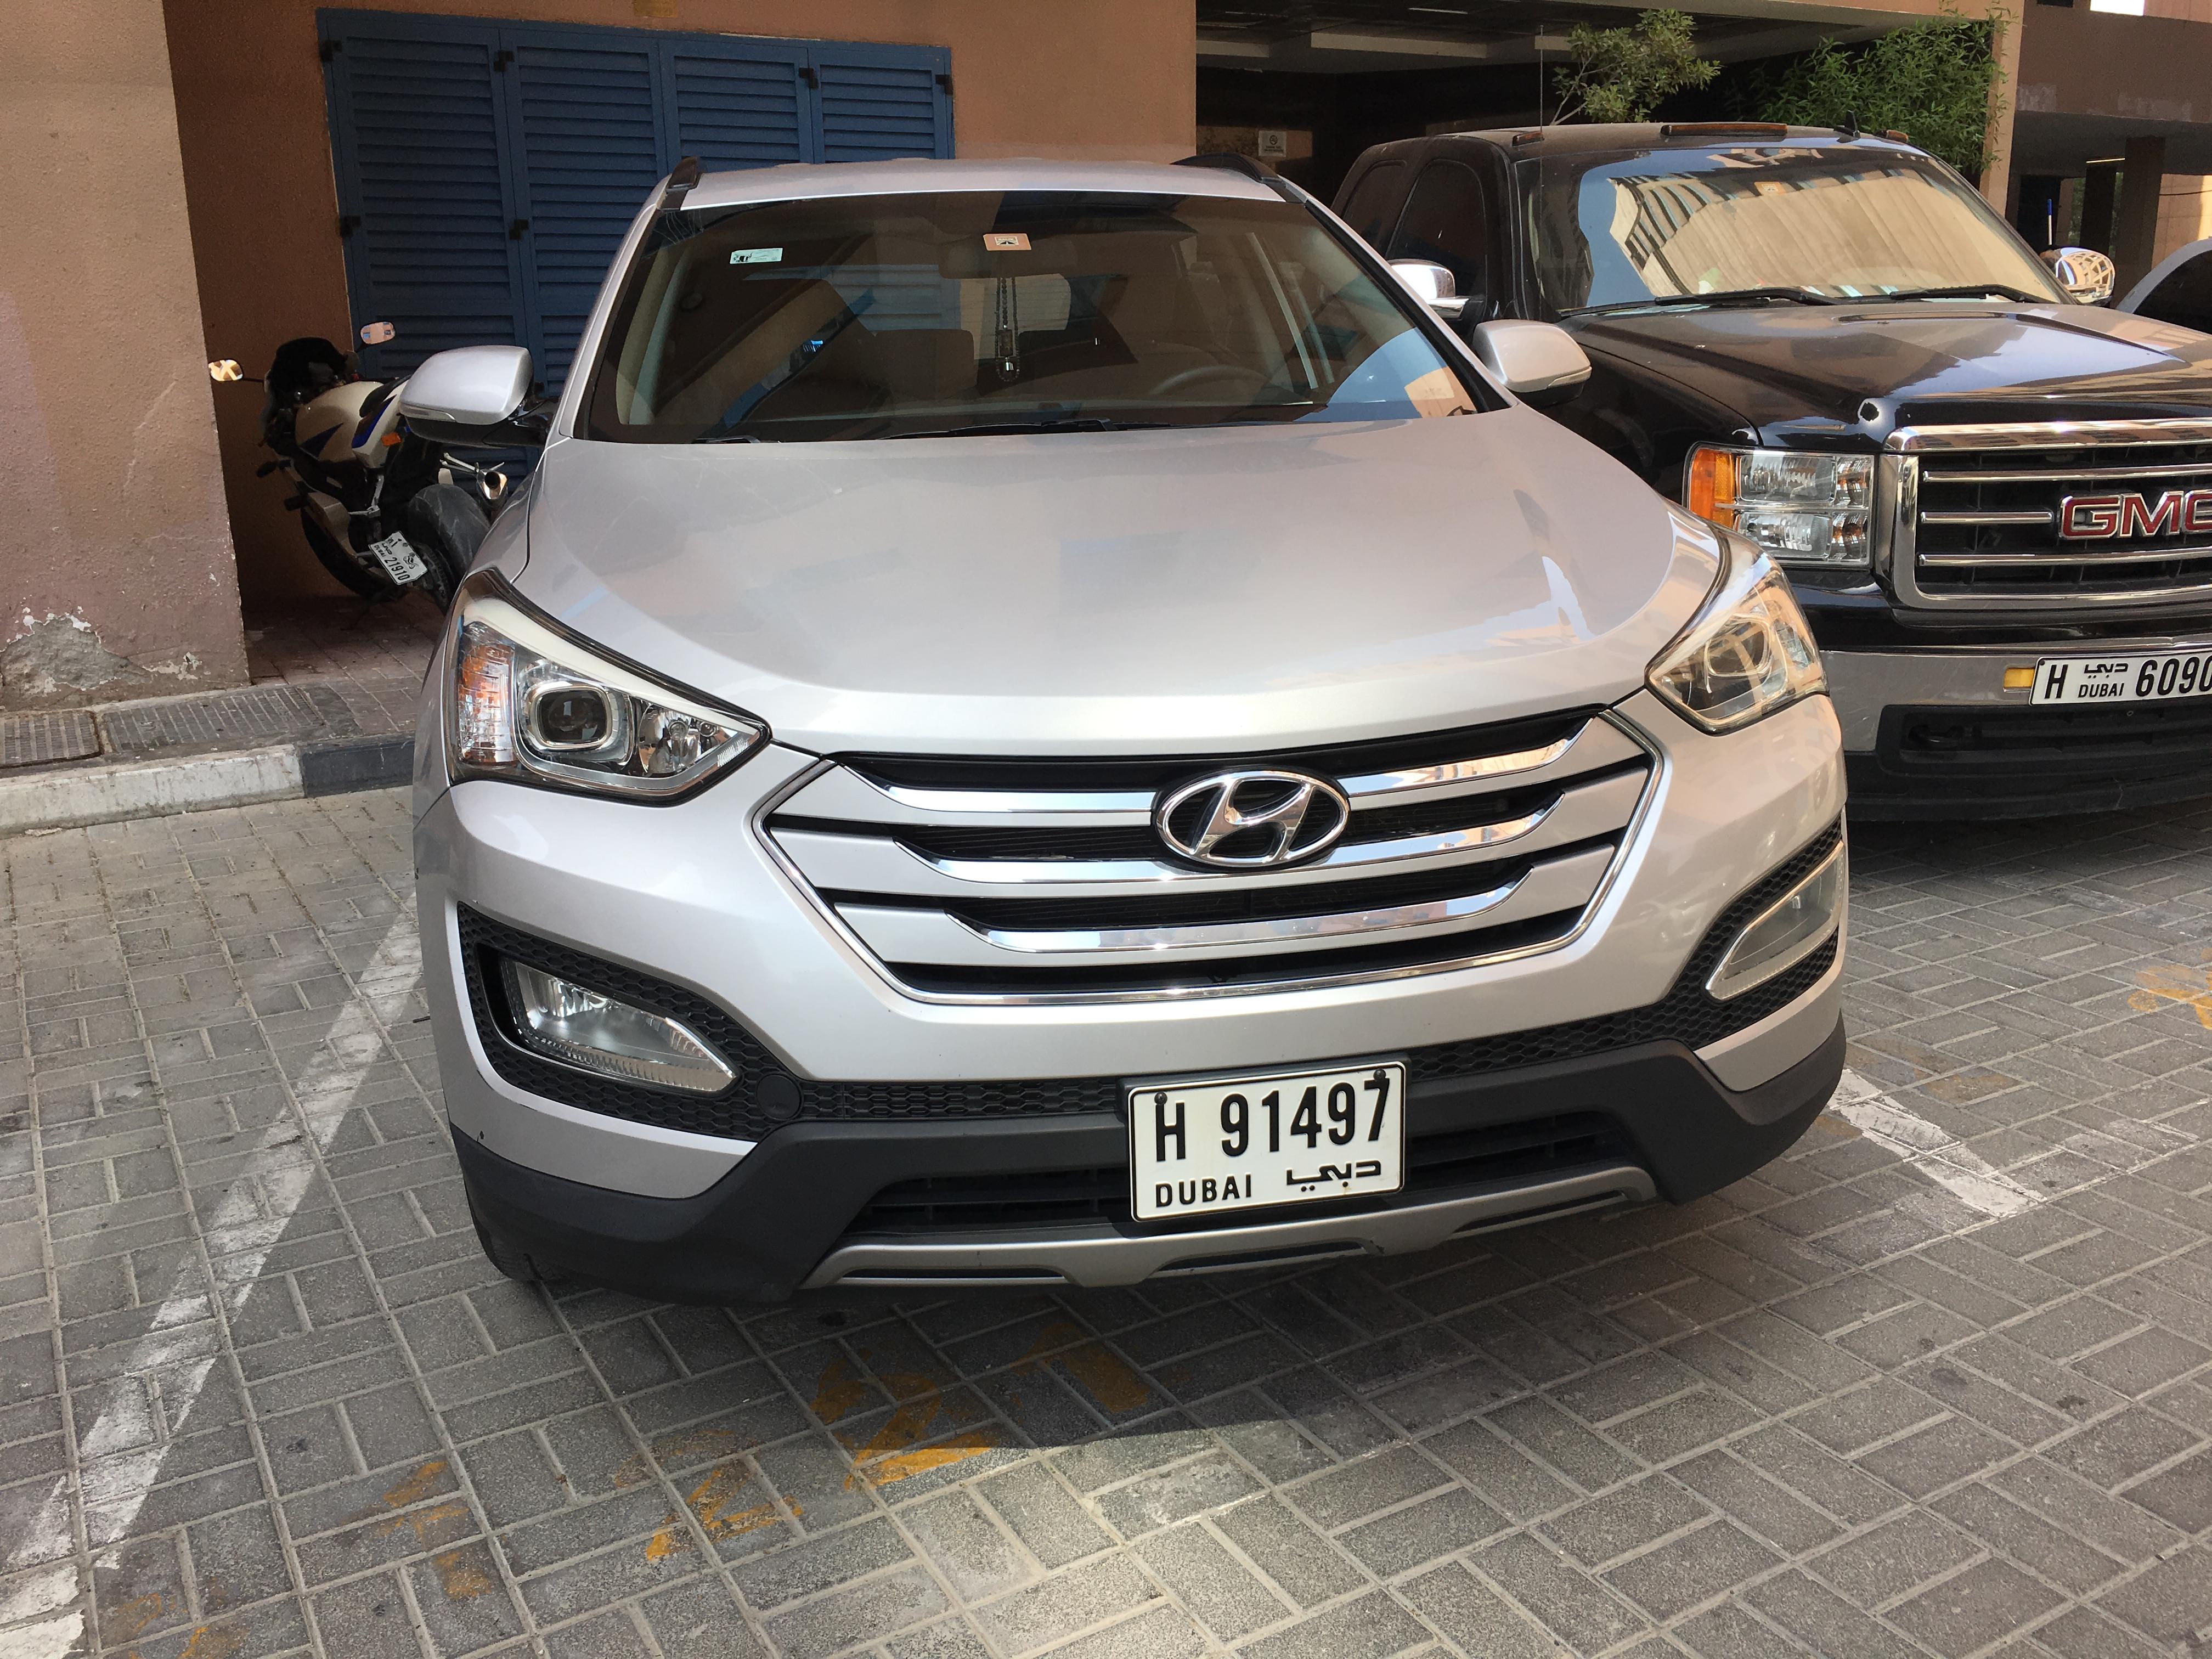 Used hyundai santa fe 2 4l fwd 2015 car for sale in dubai for Hyundai motor finance fax number